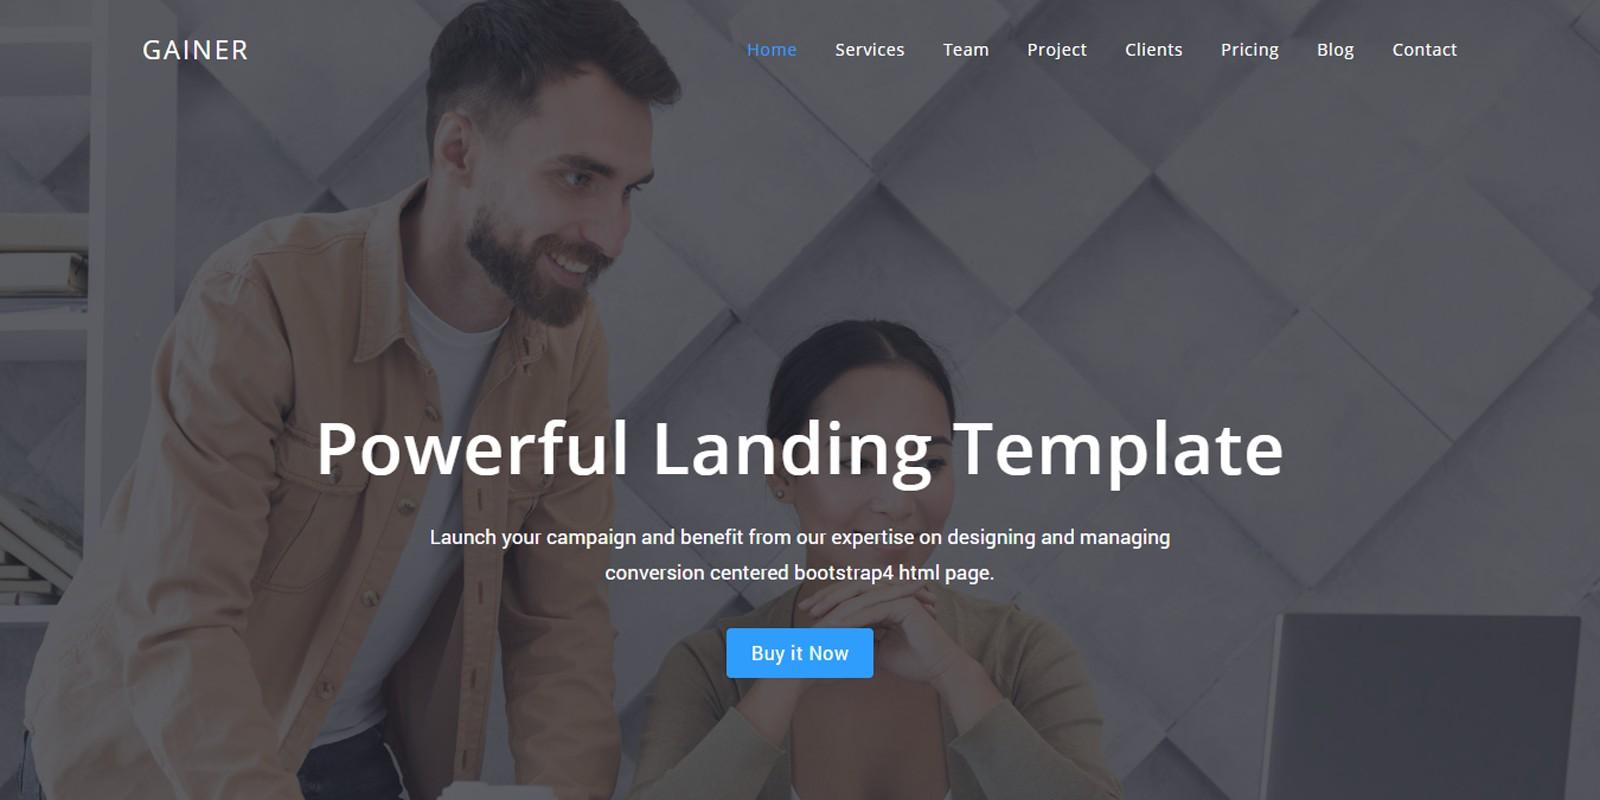 Gain - Website Landing Template